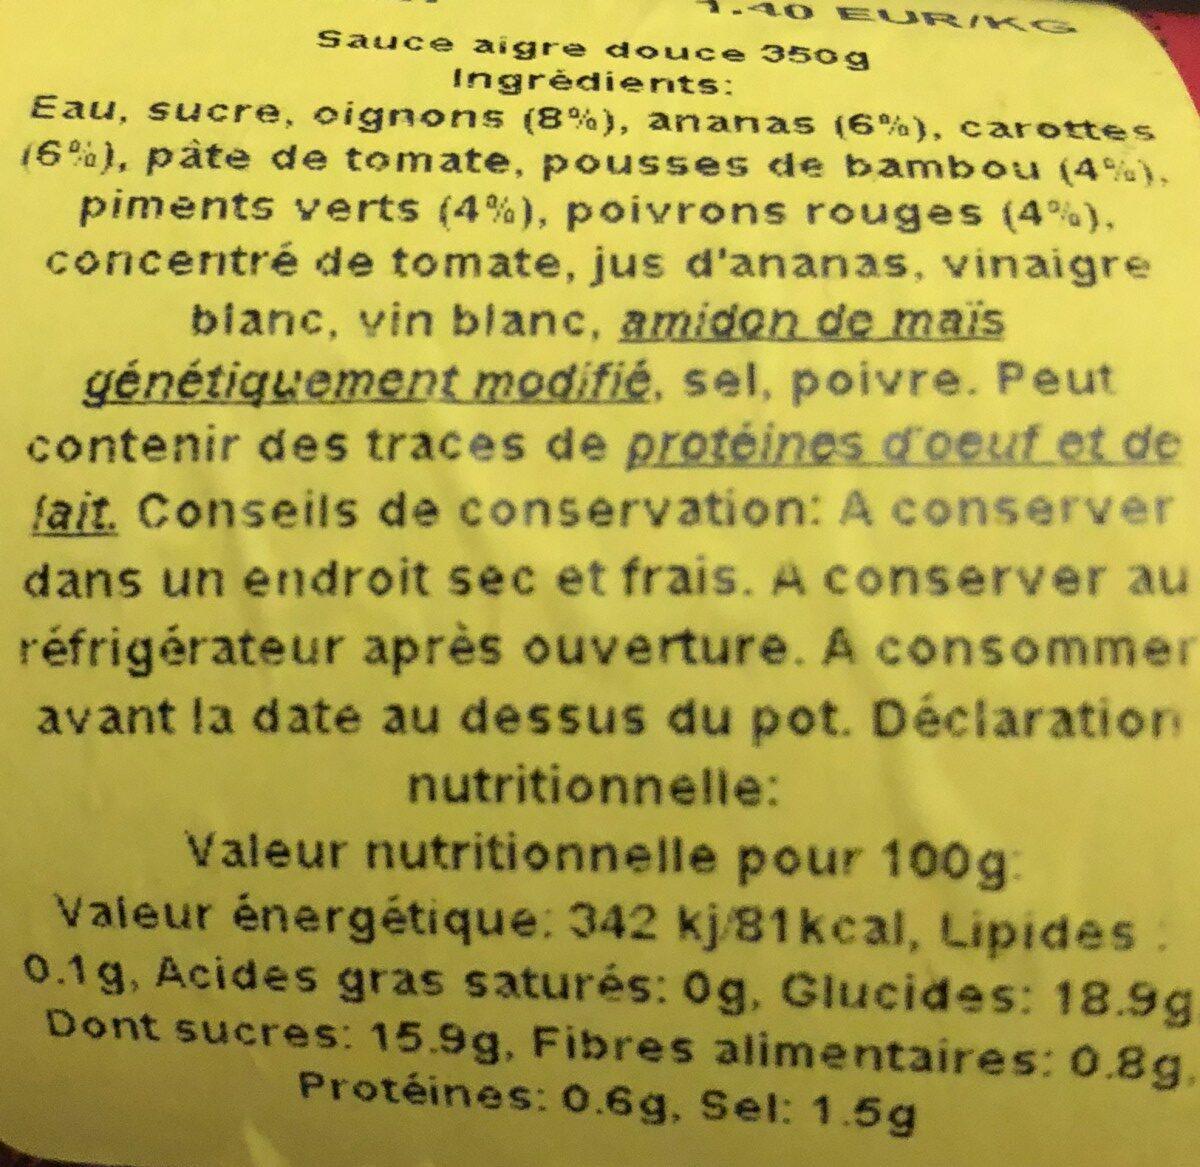 Sauce Aigre Douce - Ingredients